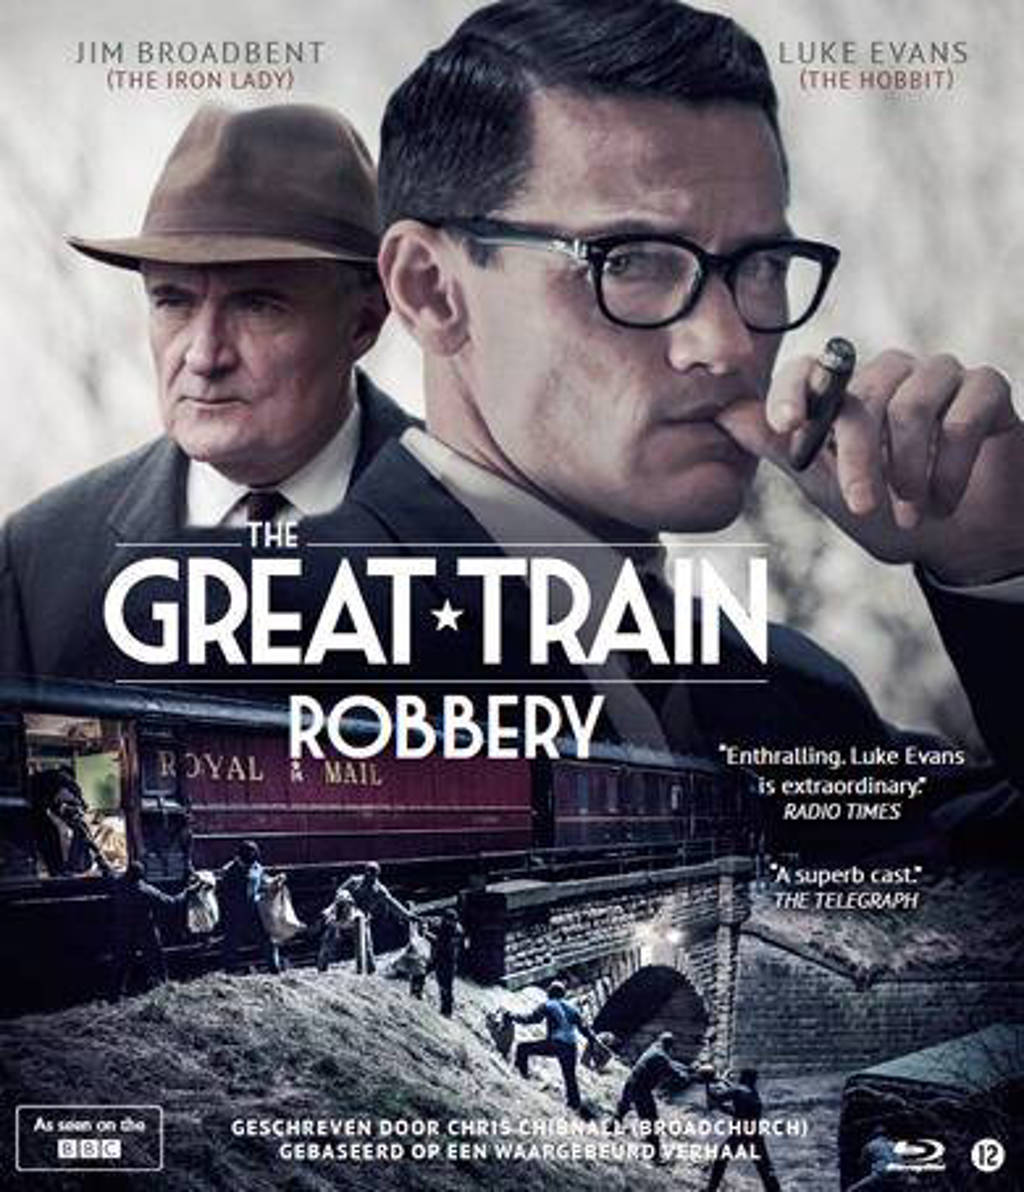 Great train robbery (Blu-ray)